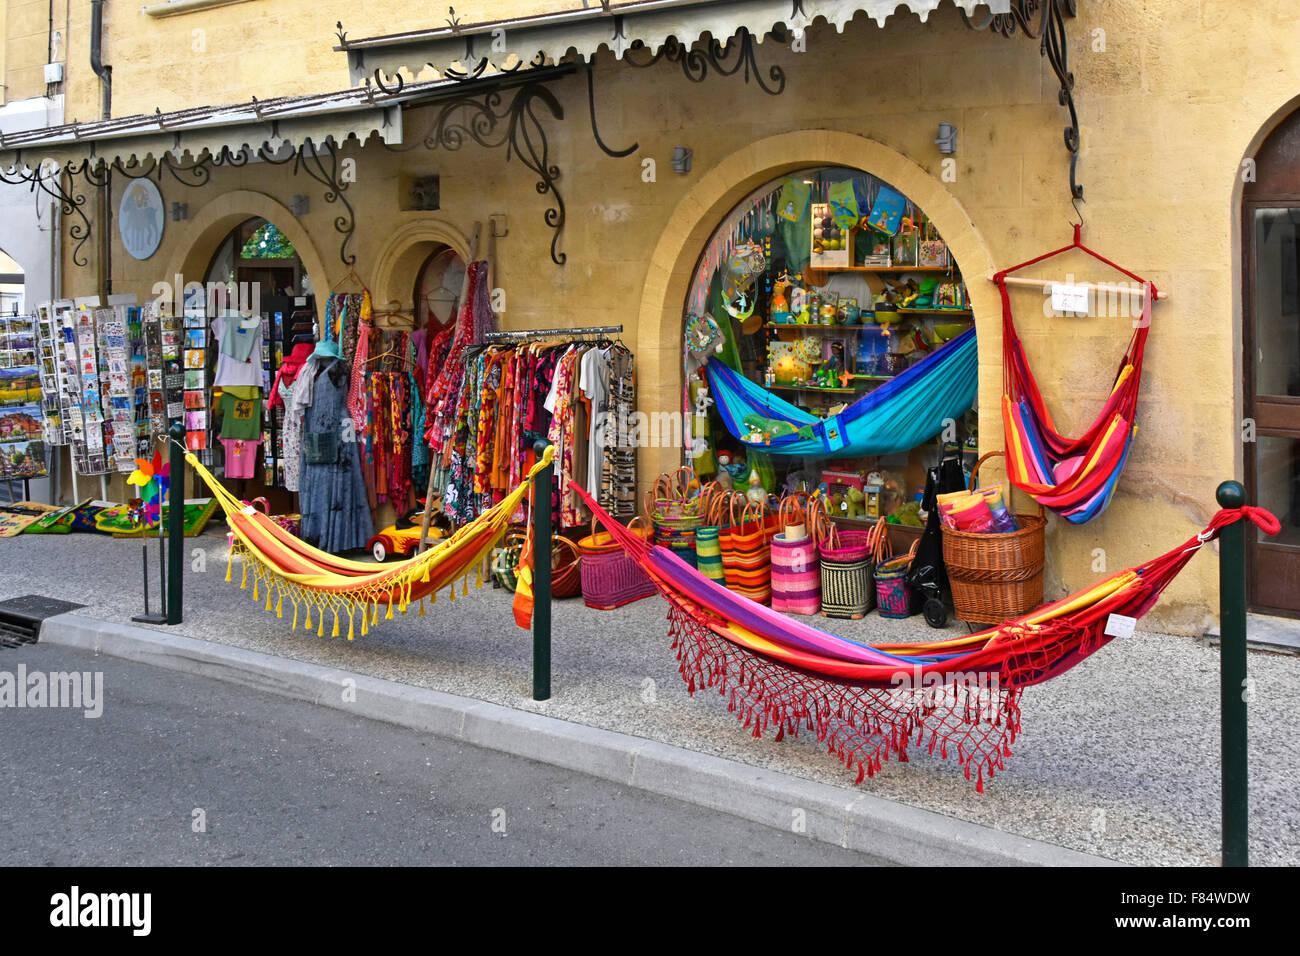 Lourmarin village street shop front pavement display of touristy summer merchandise including hammocks in Luberon, - Stock Image